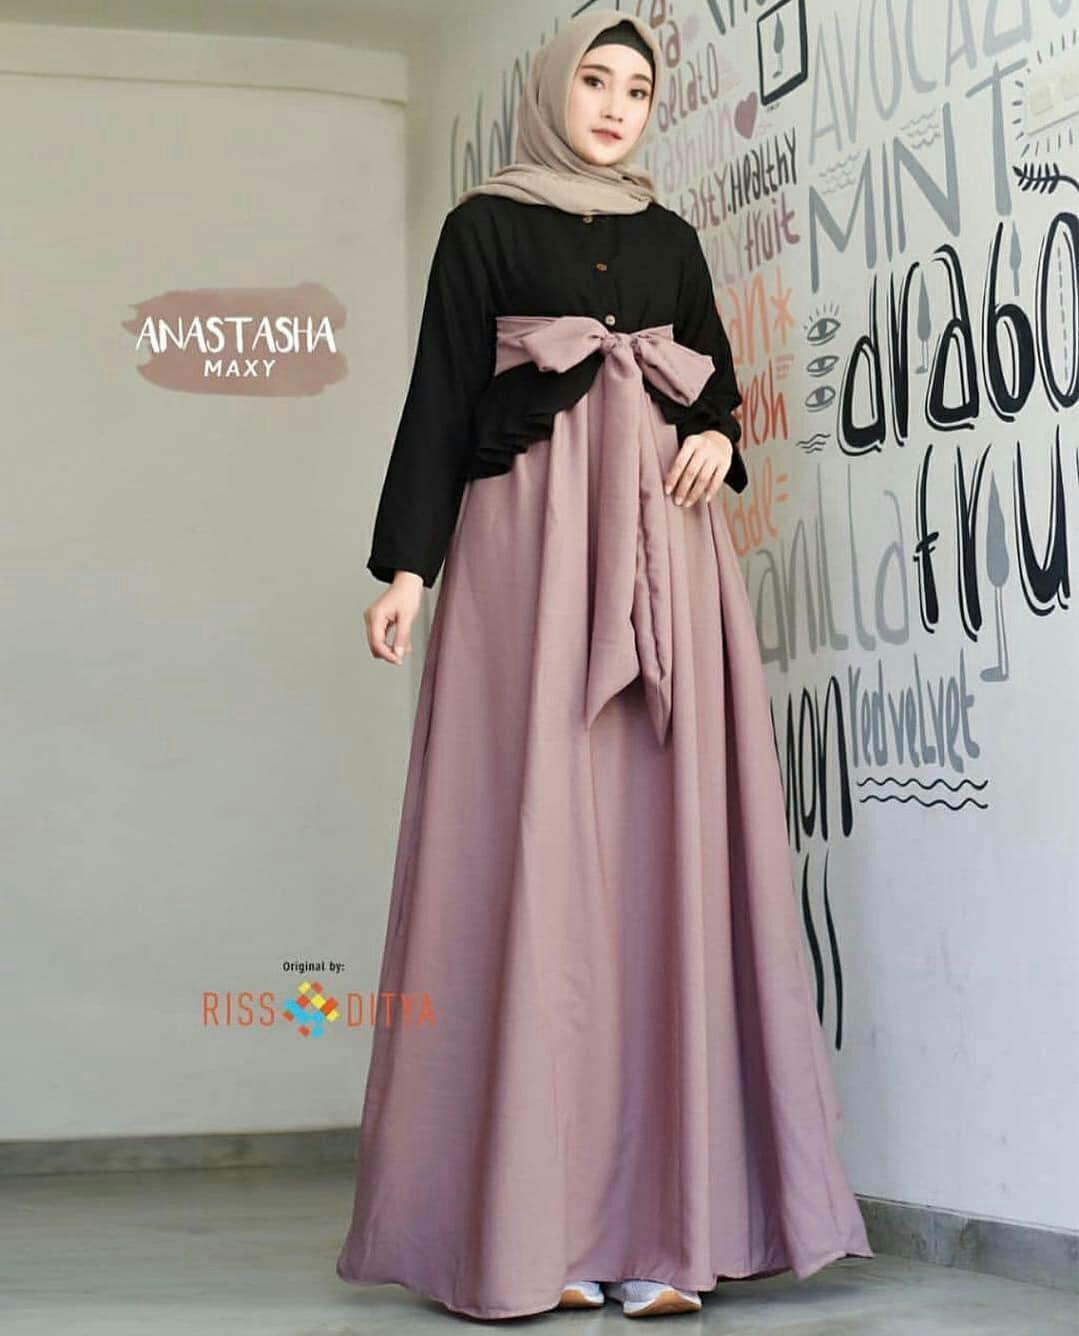 Rp88.550Baju Muslim Original Anatasya Maxy Balotely Gamis Wanita Muslimah  Maxy Panjang Grosir Pakaian Cewek Hijab Kekinian Fashion Modis Gaun  Sarimbit ... 8640ca0936